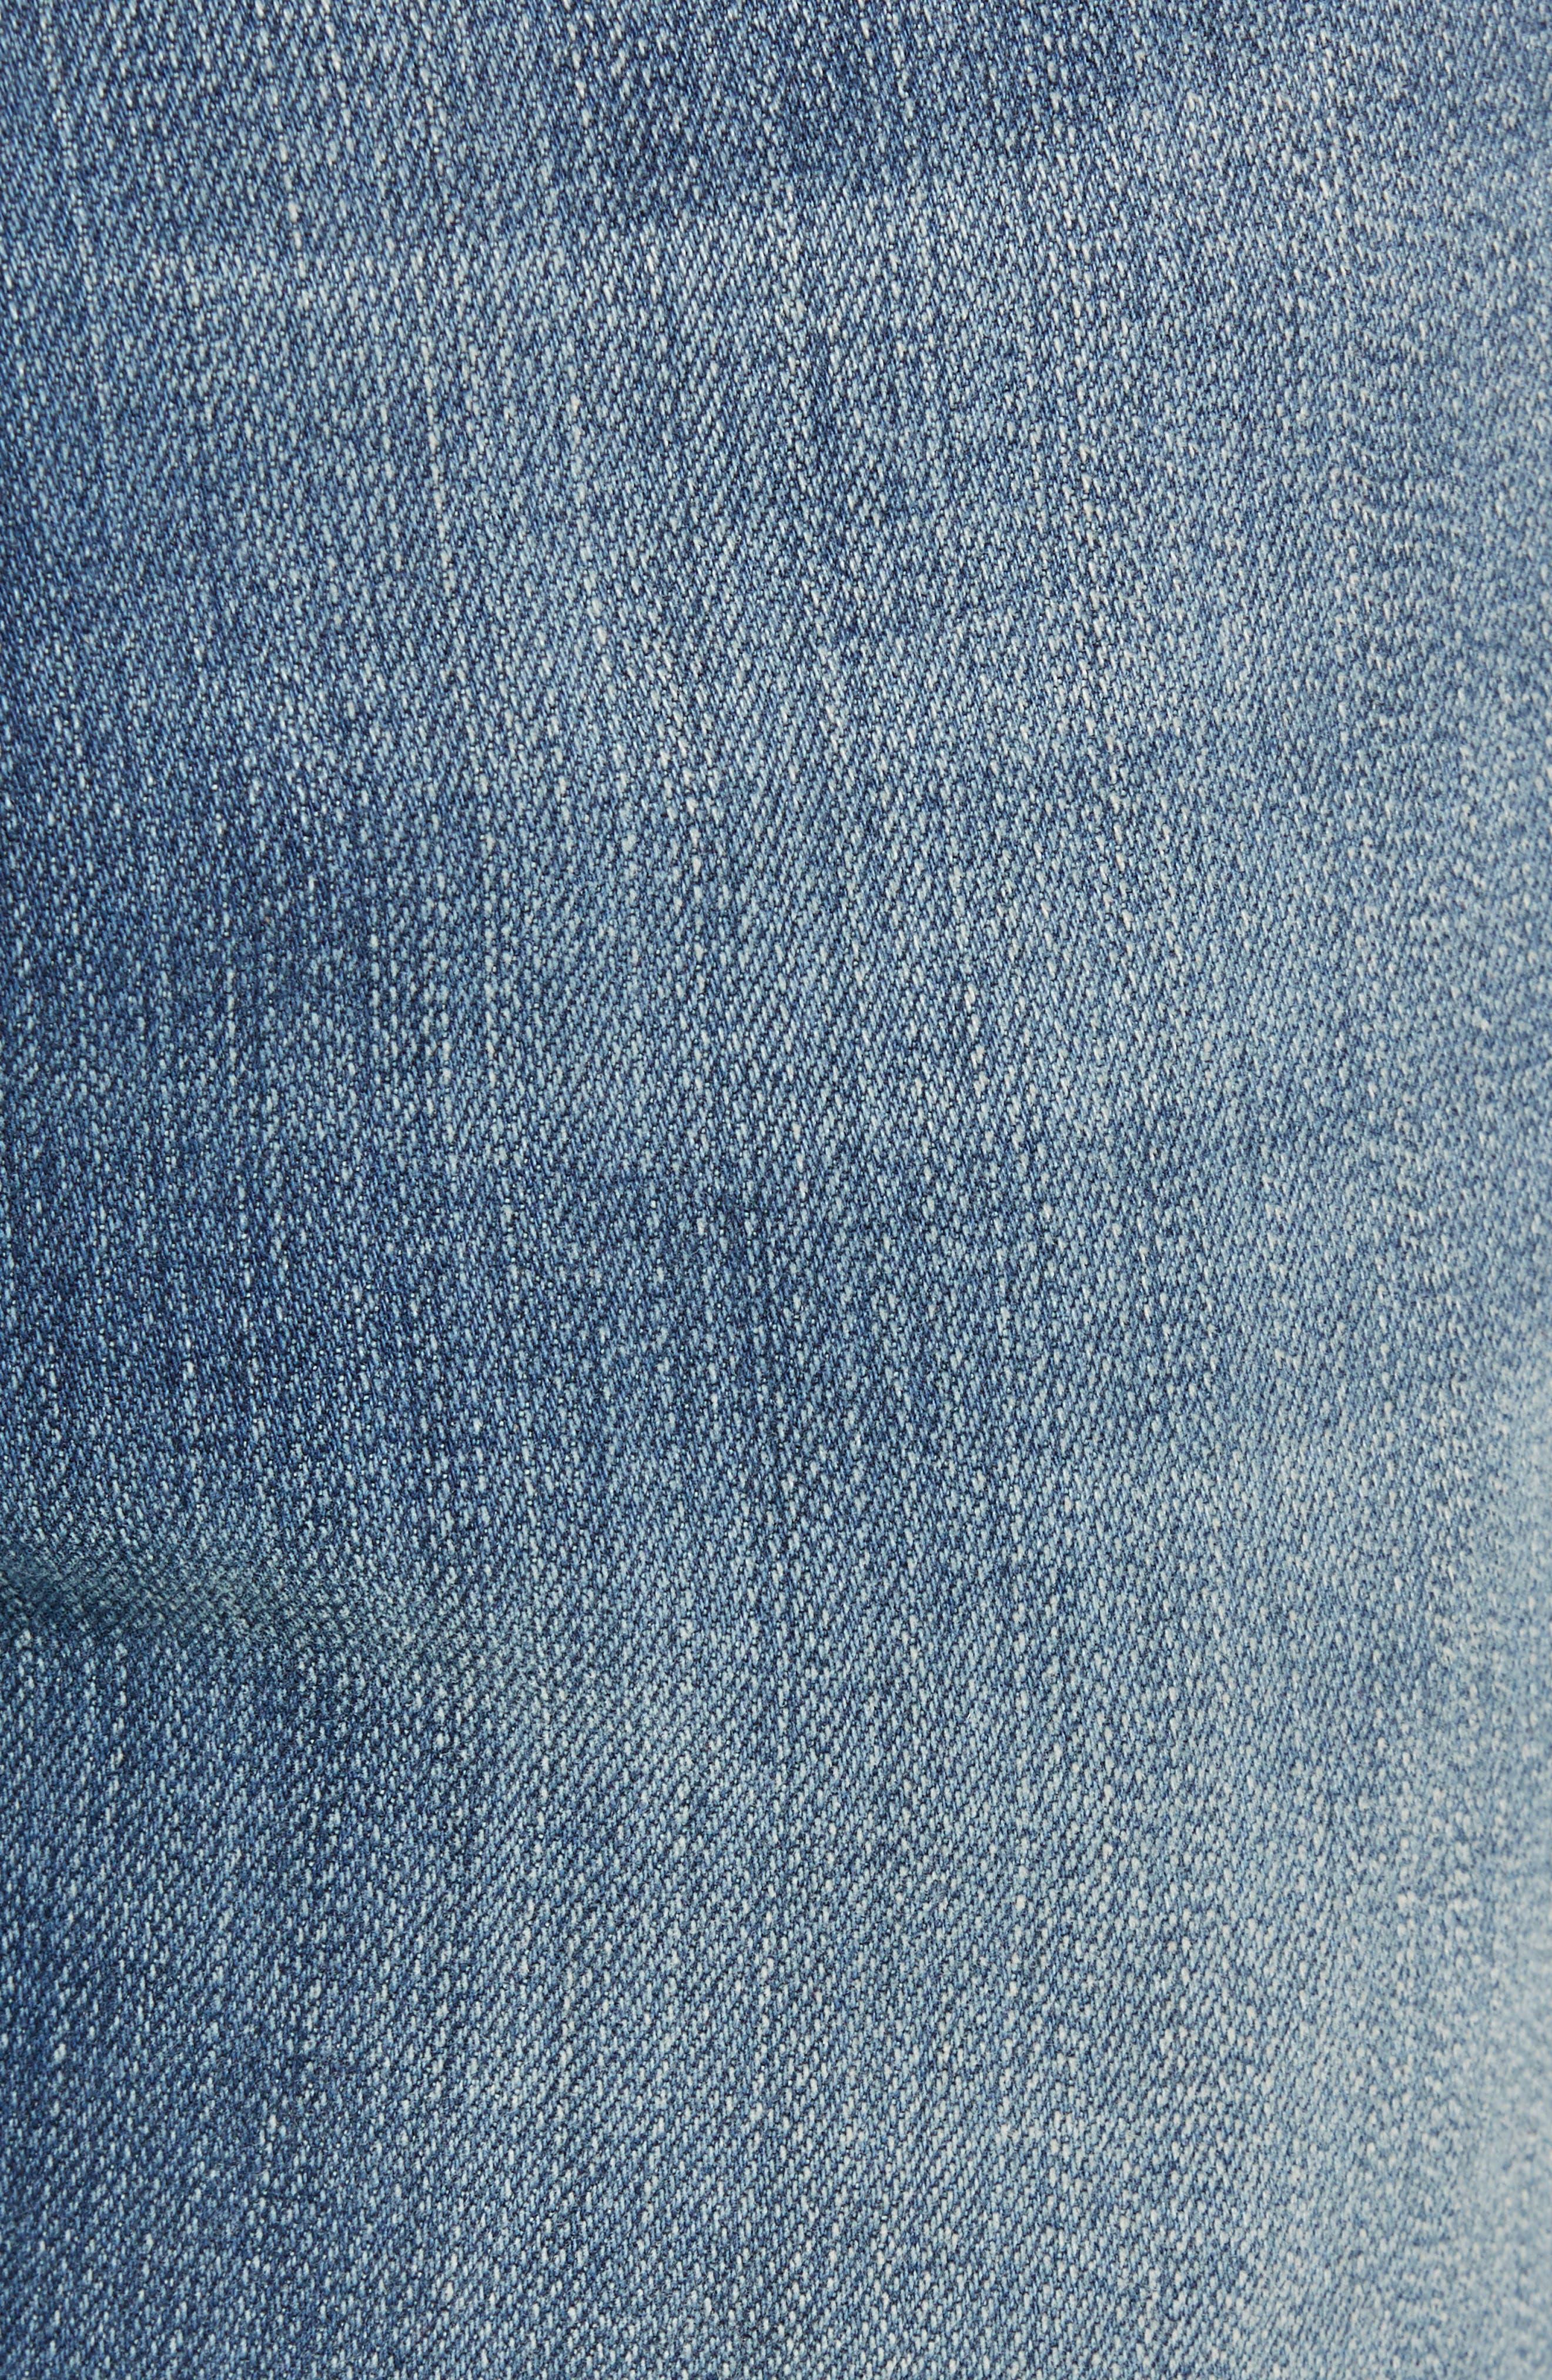 Jimmy Slim Straight Leg Jeans,                             Alternate thumbnail 5, color,                             SYNDICATE BLUE